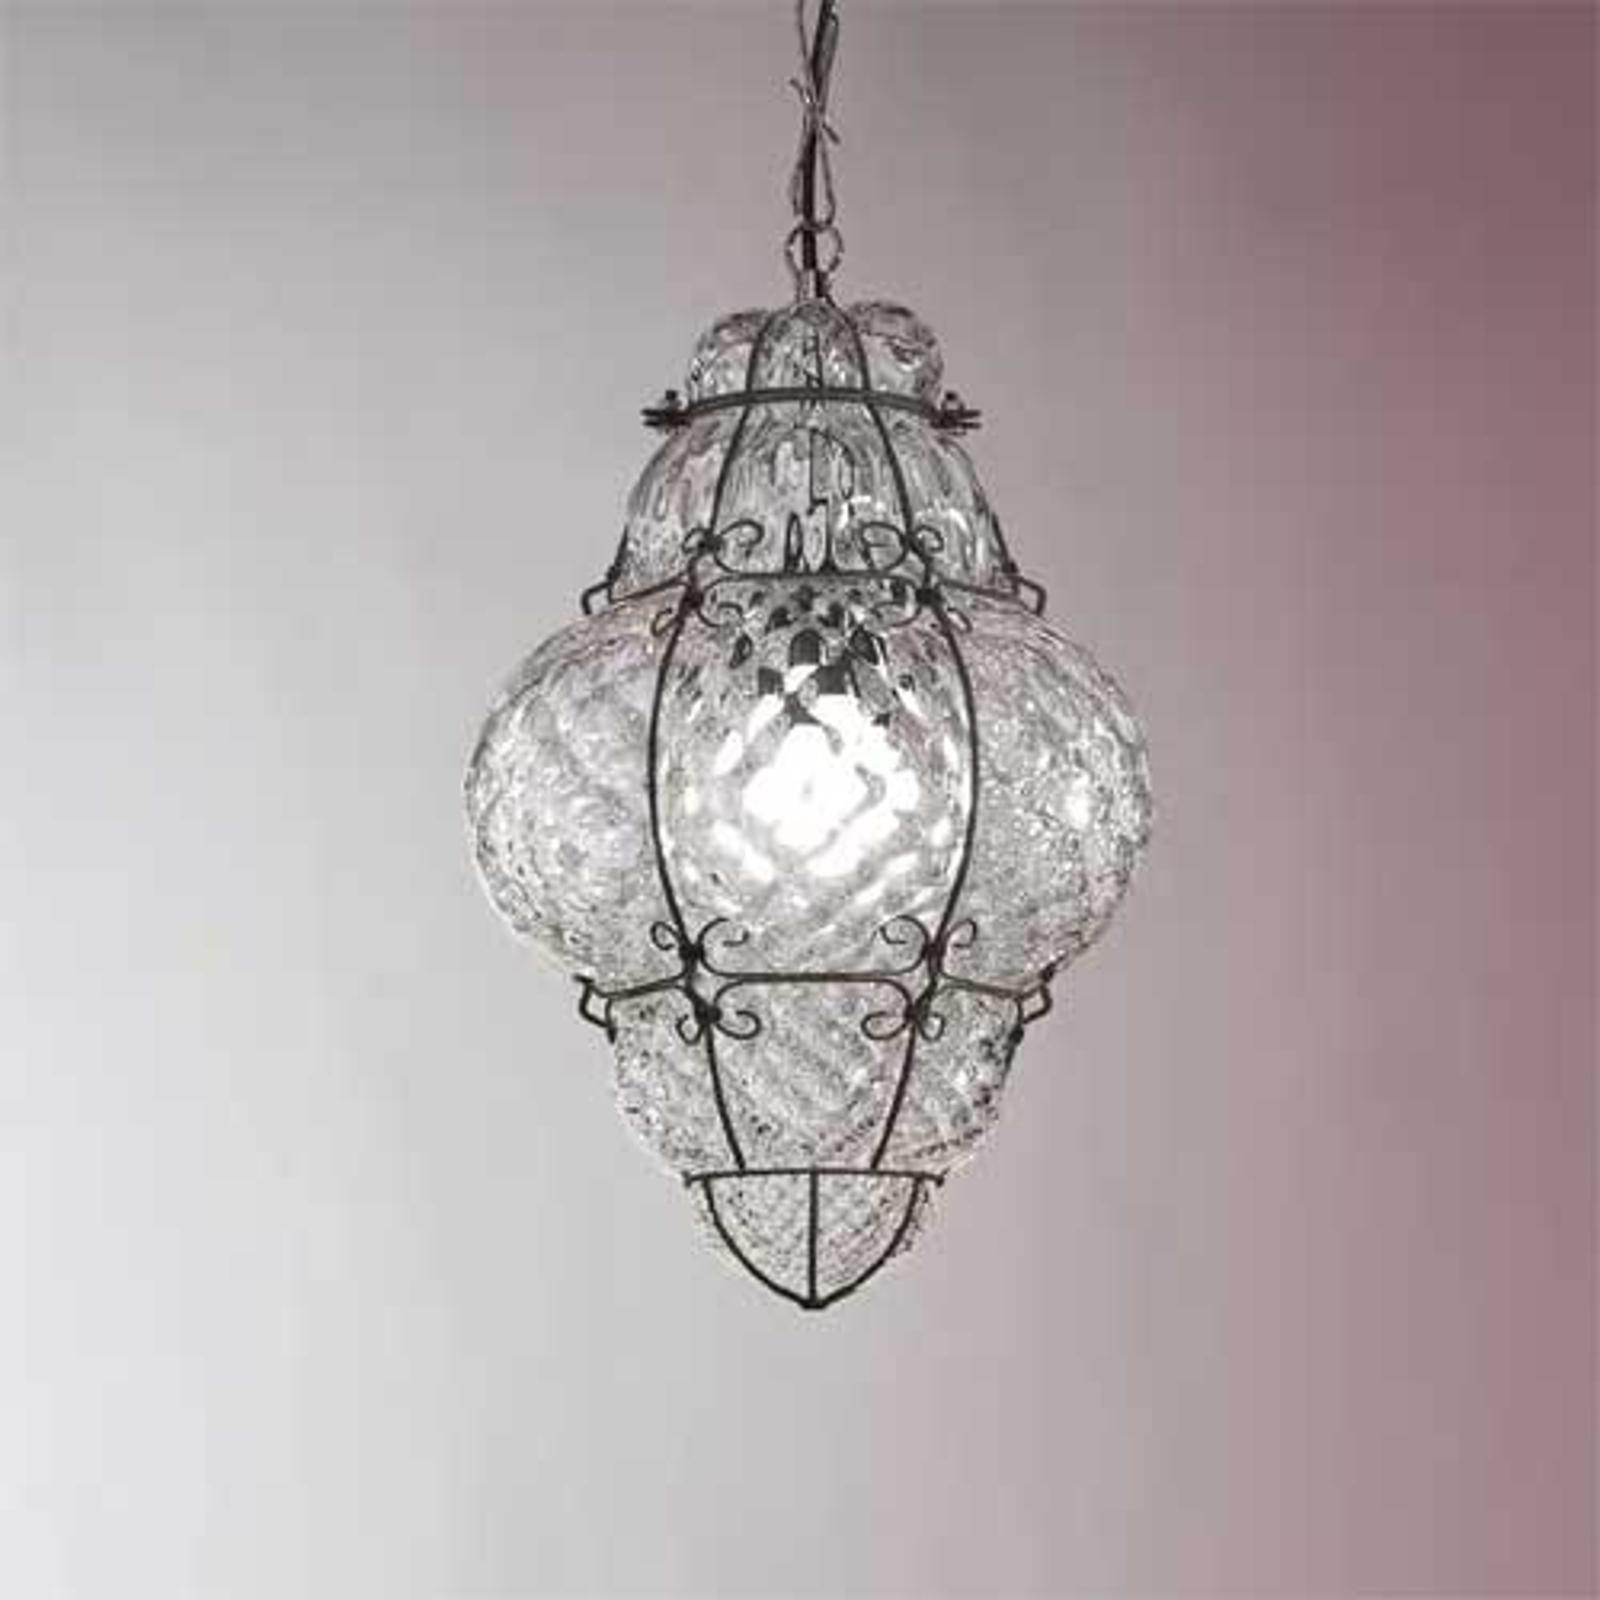 CLASSIC mundblæst hængelampe 30 cm